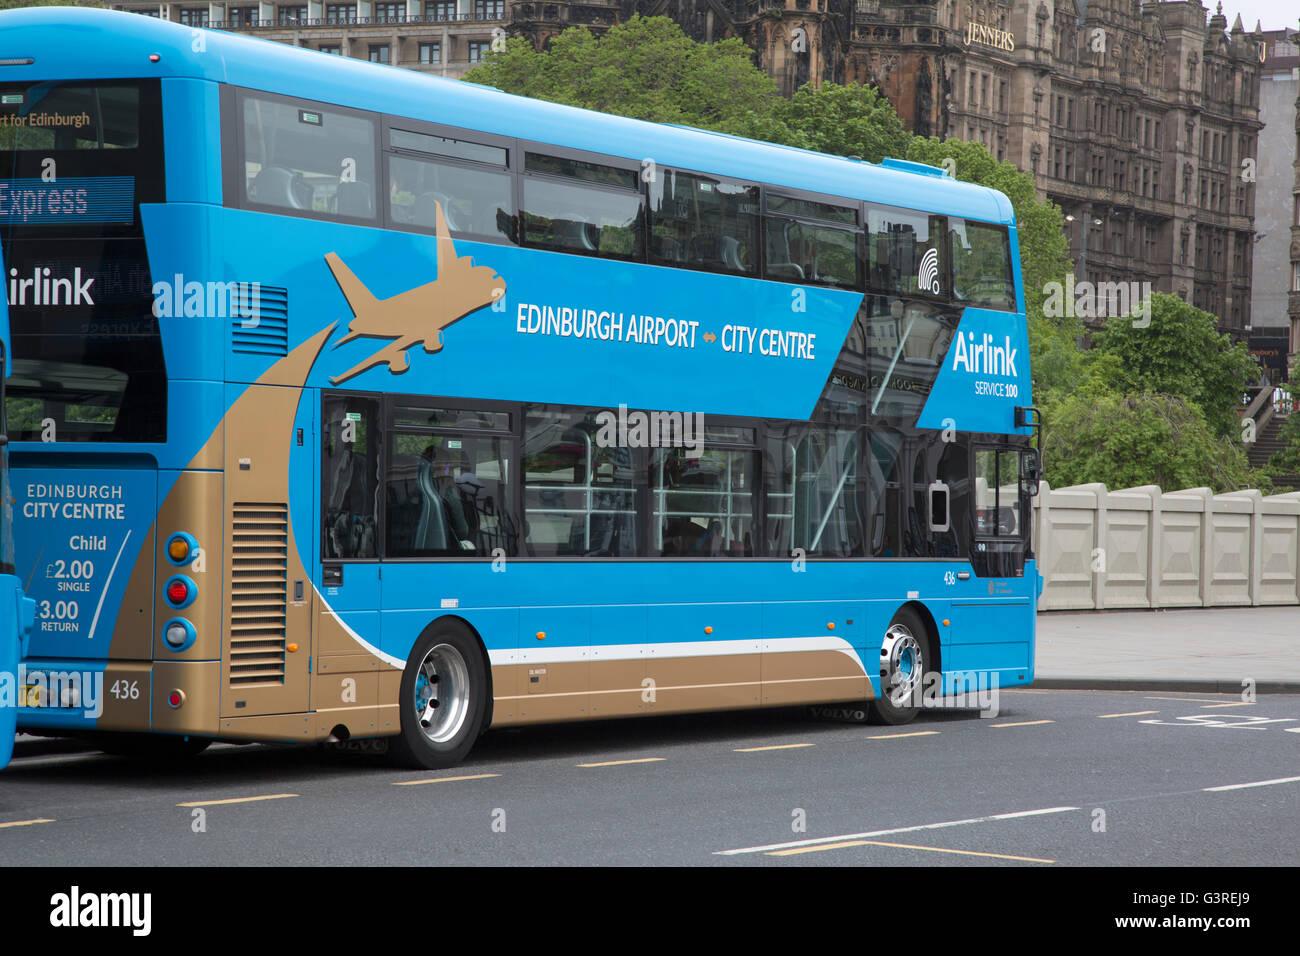 Edinburgh Airport Airlink Bus Scotland Uk Stock Photo Alamy